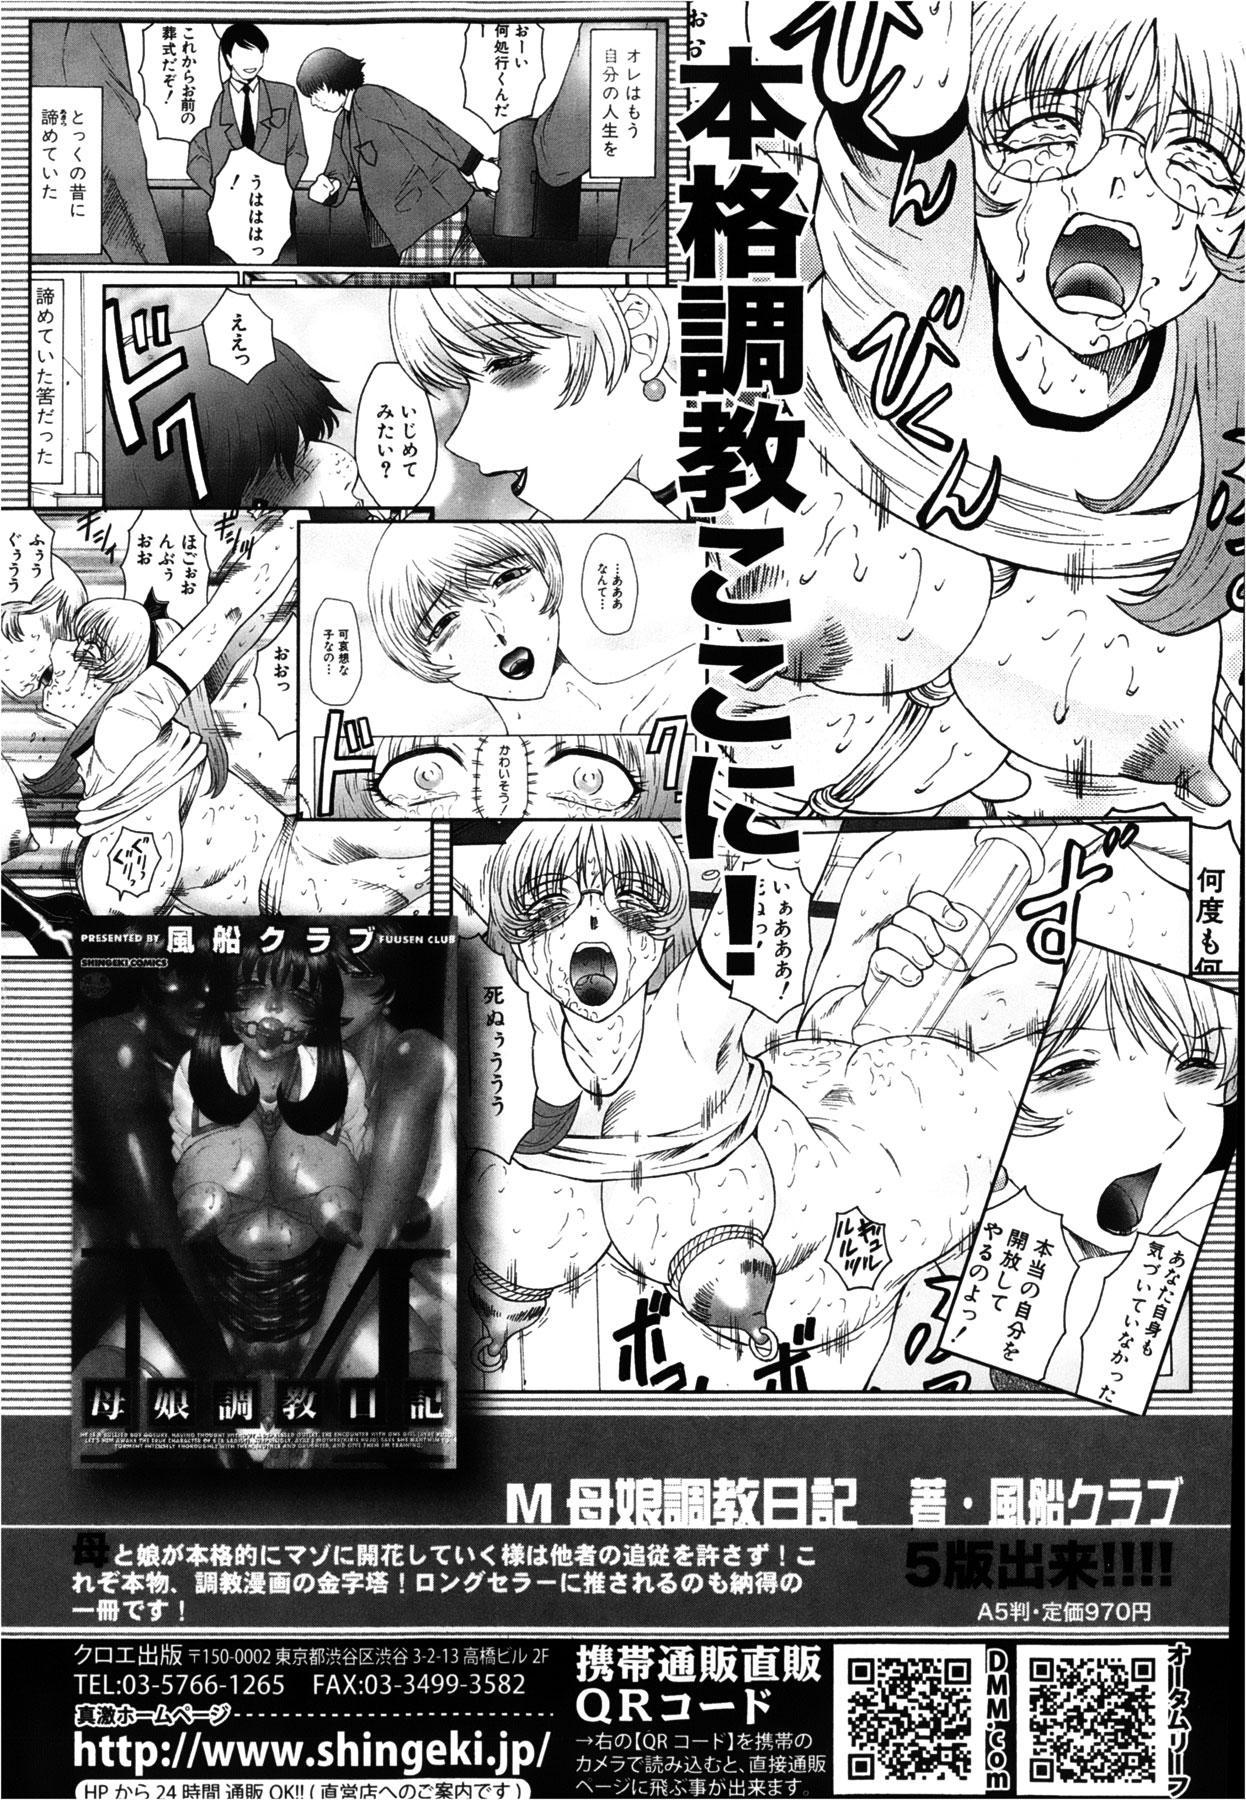 COMIC Shingeki 2013-02 334